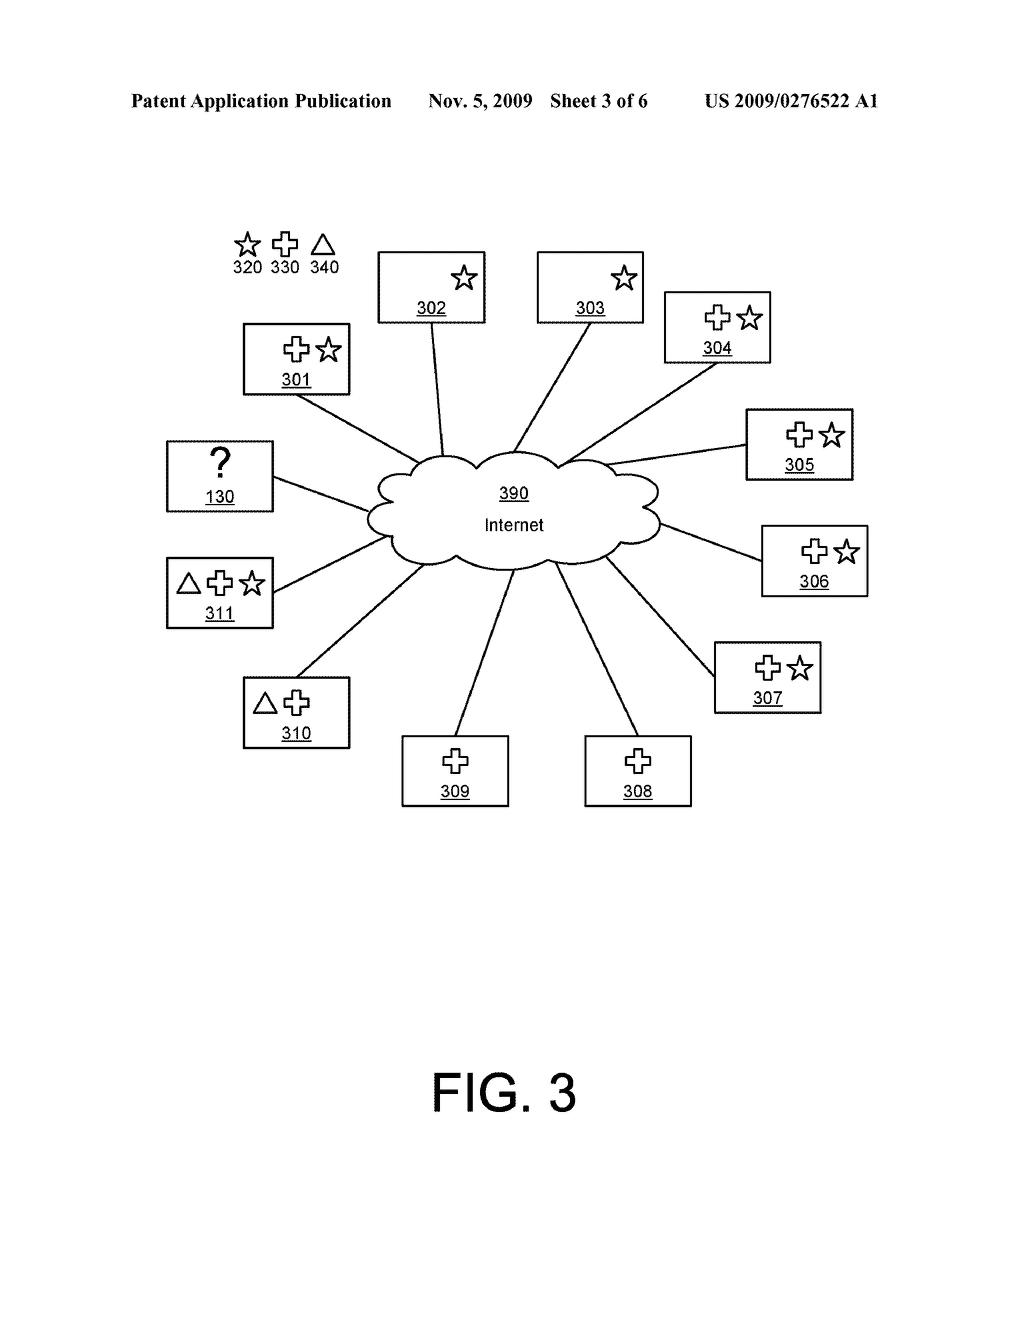 COOPERATIVE MONITORING OF PEER TO PEER NETWORK ACTIVITY Diagram